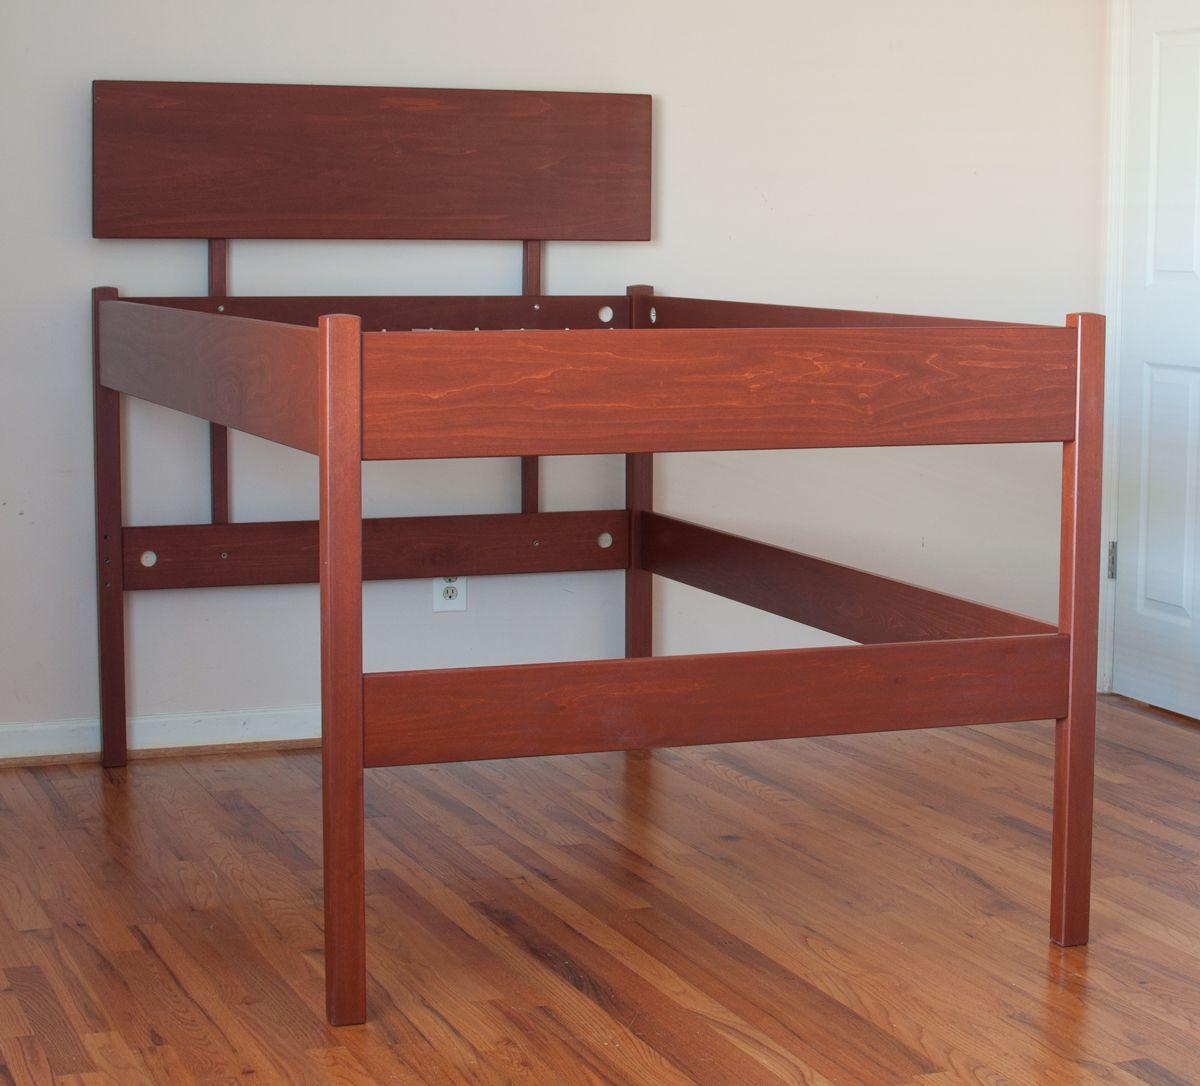 Brown wood high raised platform bed frame for queen size decofurnish